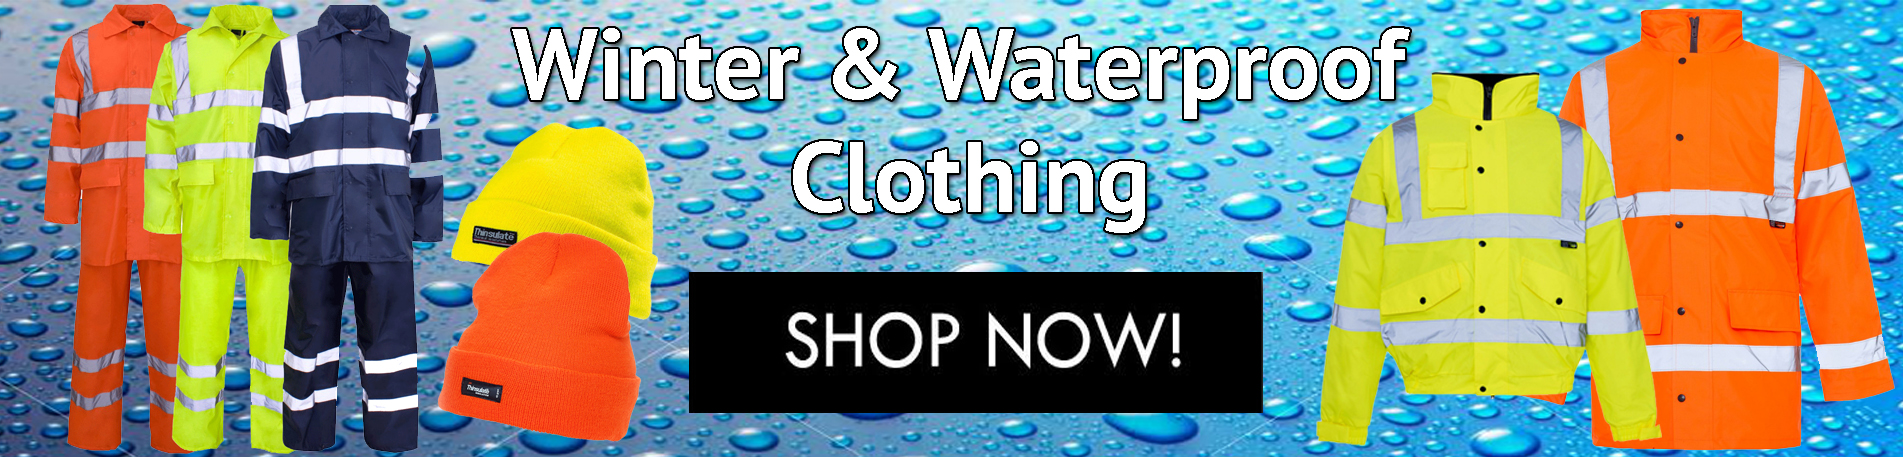 winter and waterproof hi vis banner